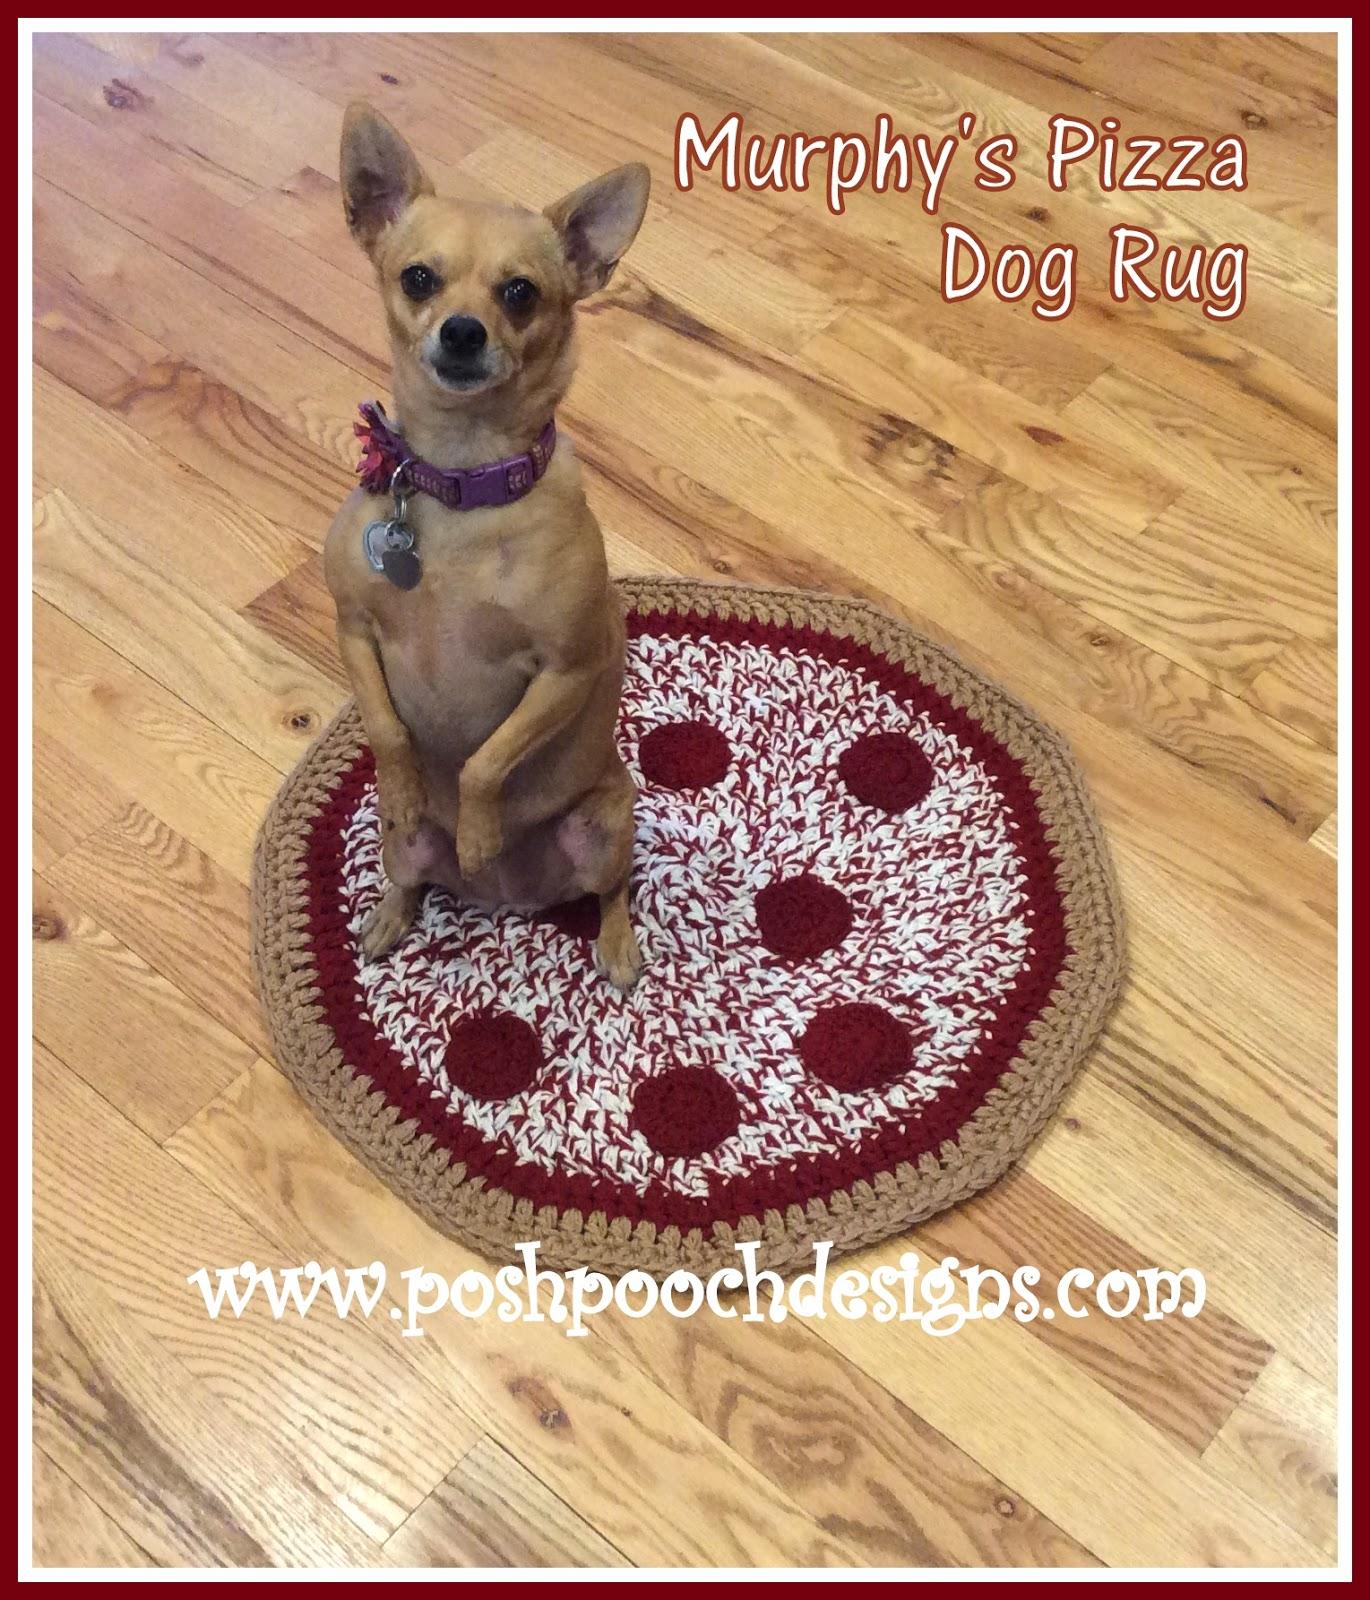 Posh Pooch Designs Dog Clothes: Murphy's Pizza Dog Rug